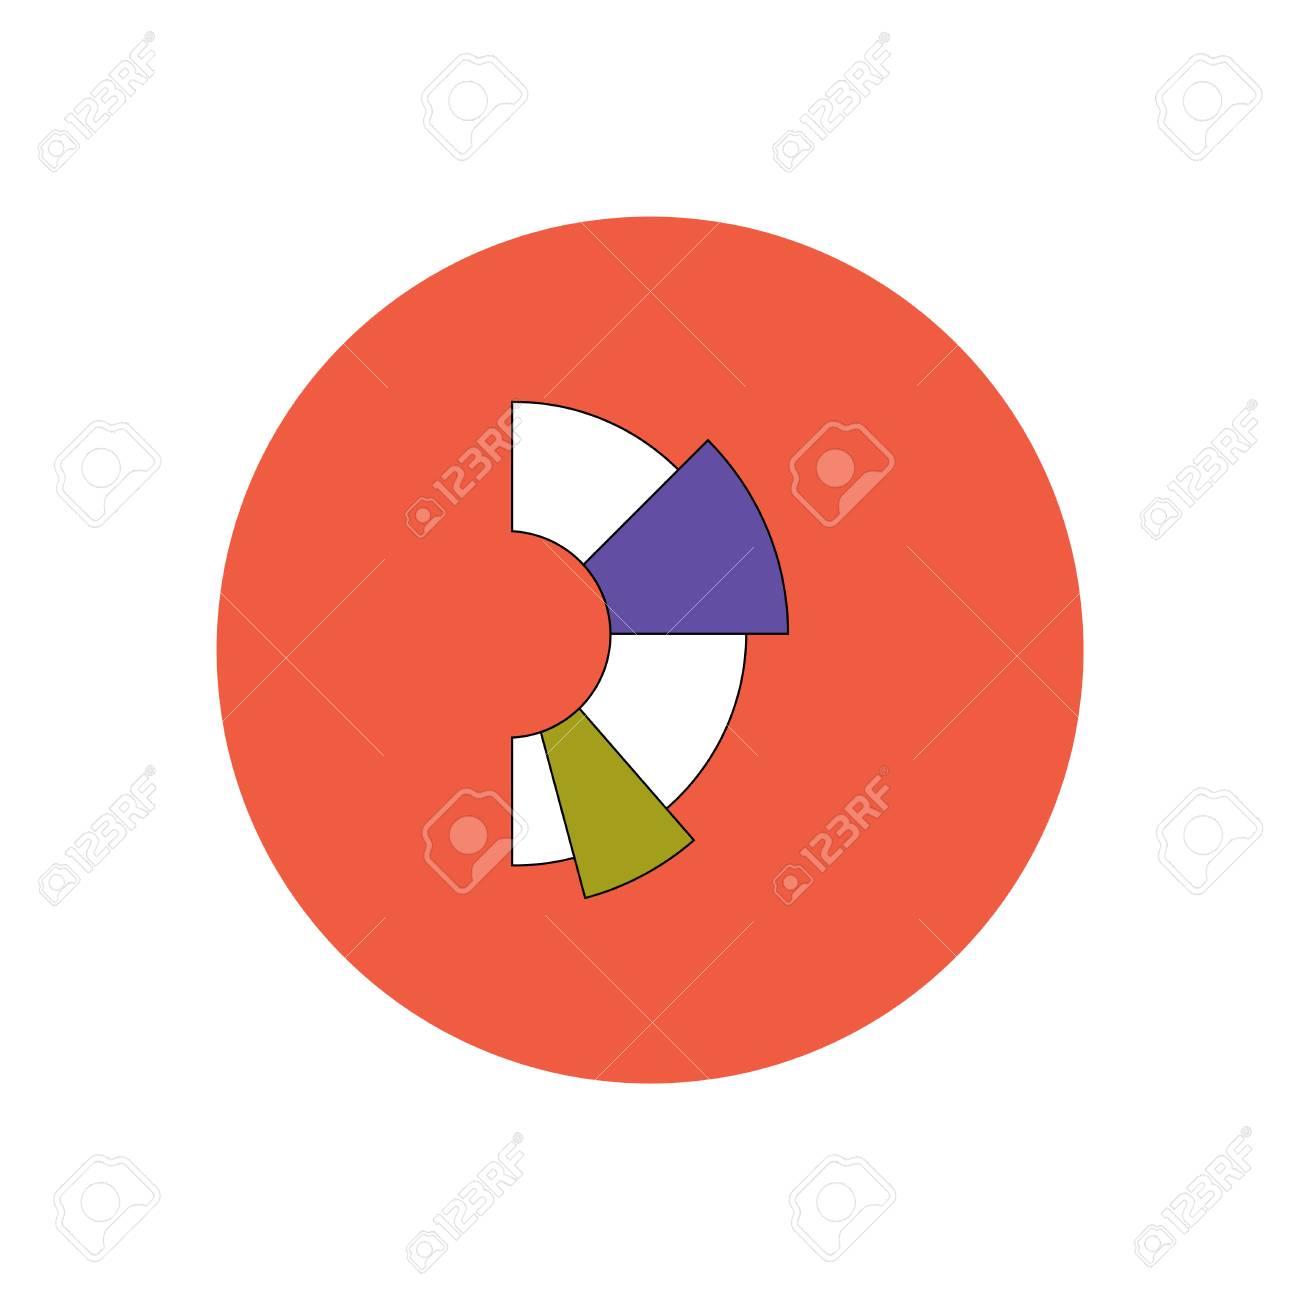 Vector Illustration In Flat Design Of Business Half Pie Chart